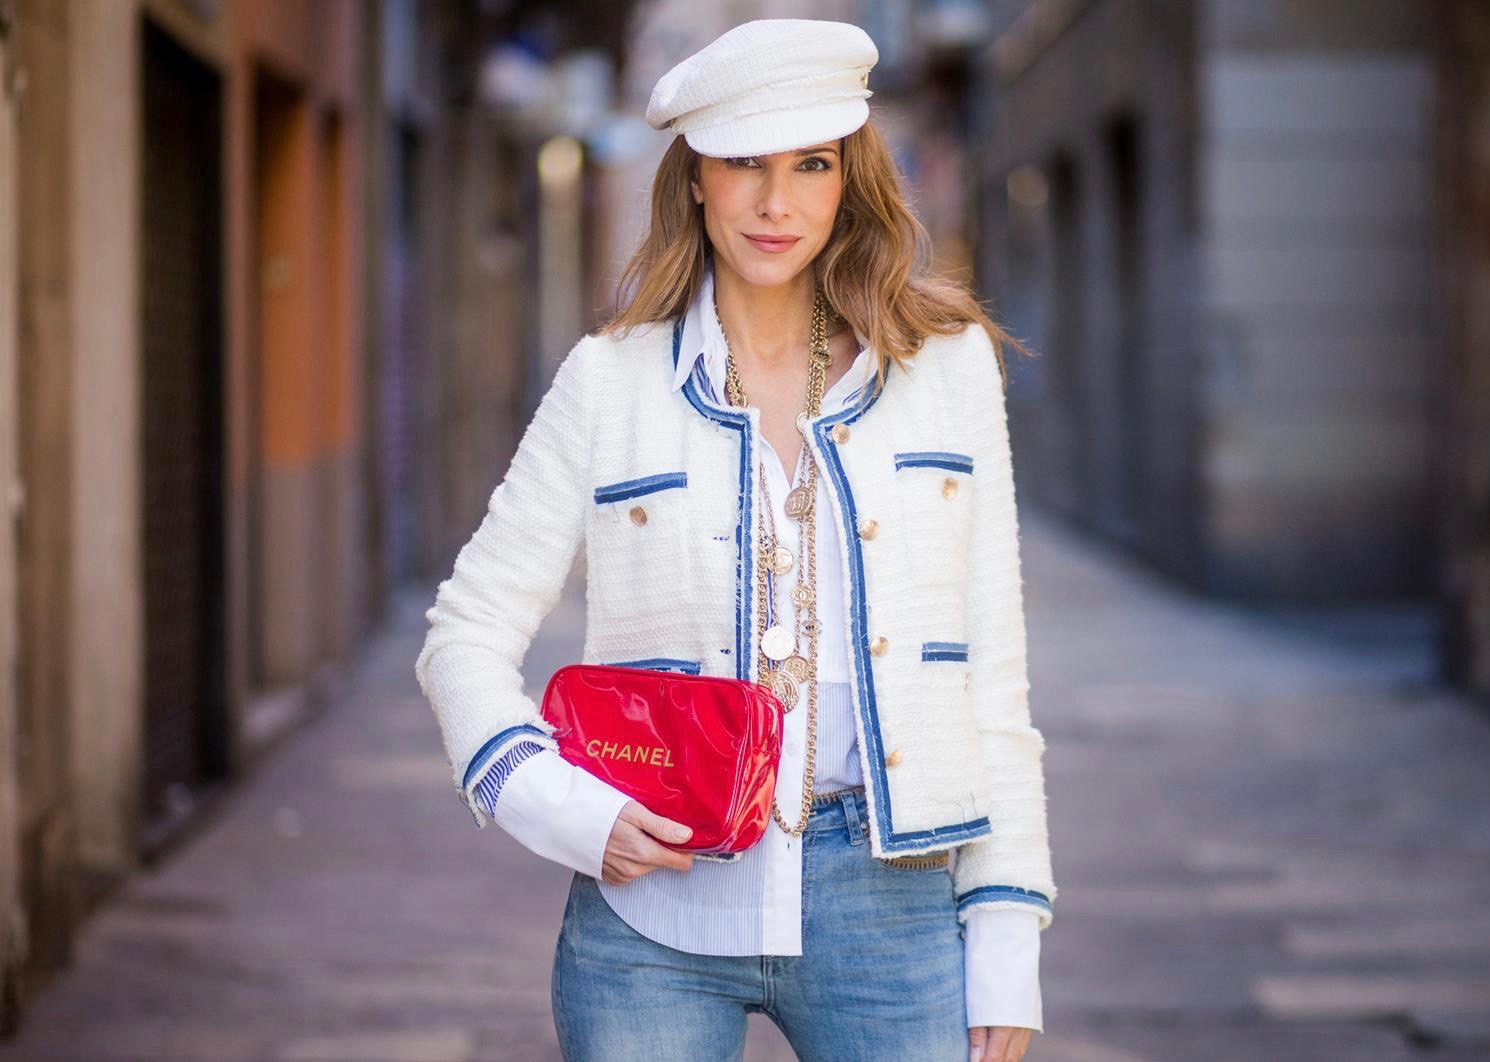 4c9e69eab5f9 ... SPAIN - NOVEMBER 28: Alexandra Lapp wearing a classic navy and white  tweed ...